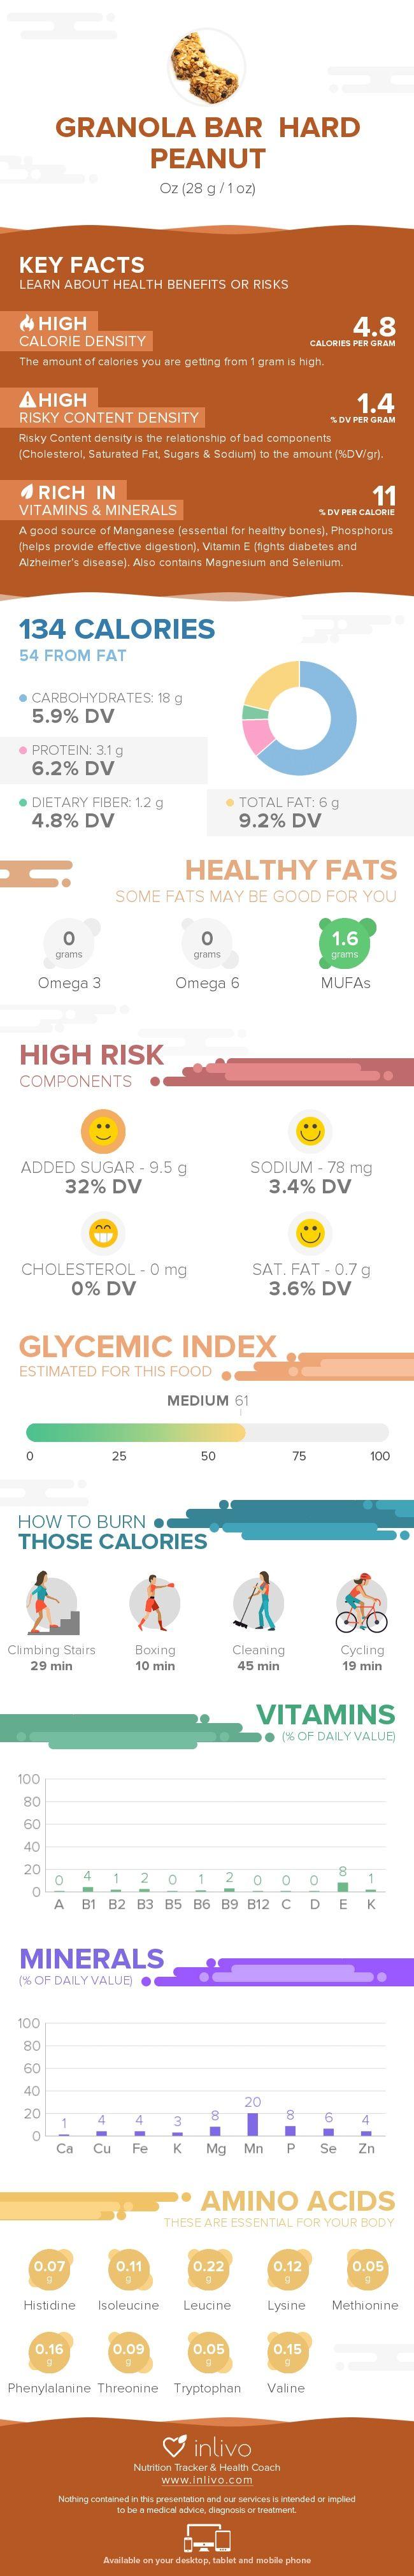 Granola Bar  Hard Peanut Nutrition Infographic #nutrigraphics #inlivo